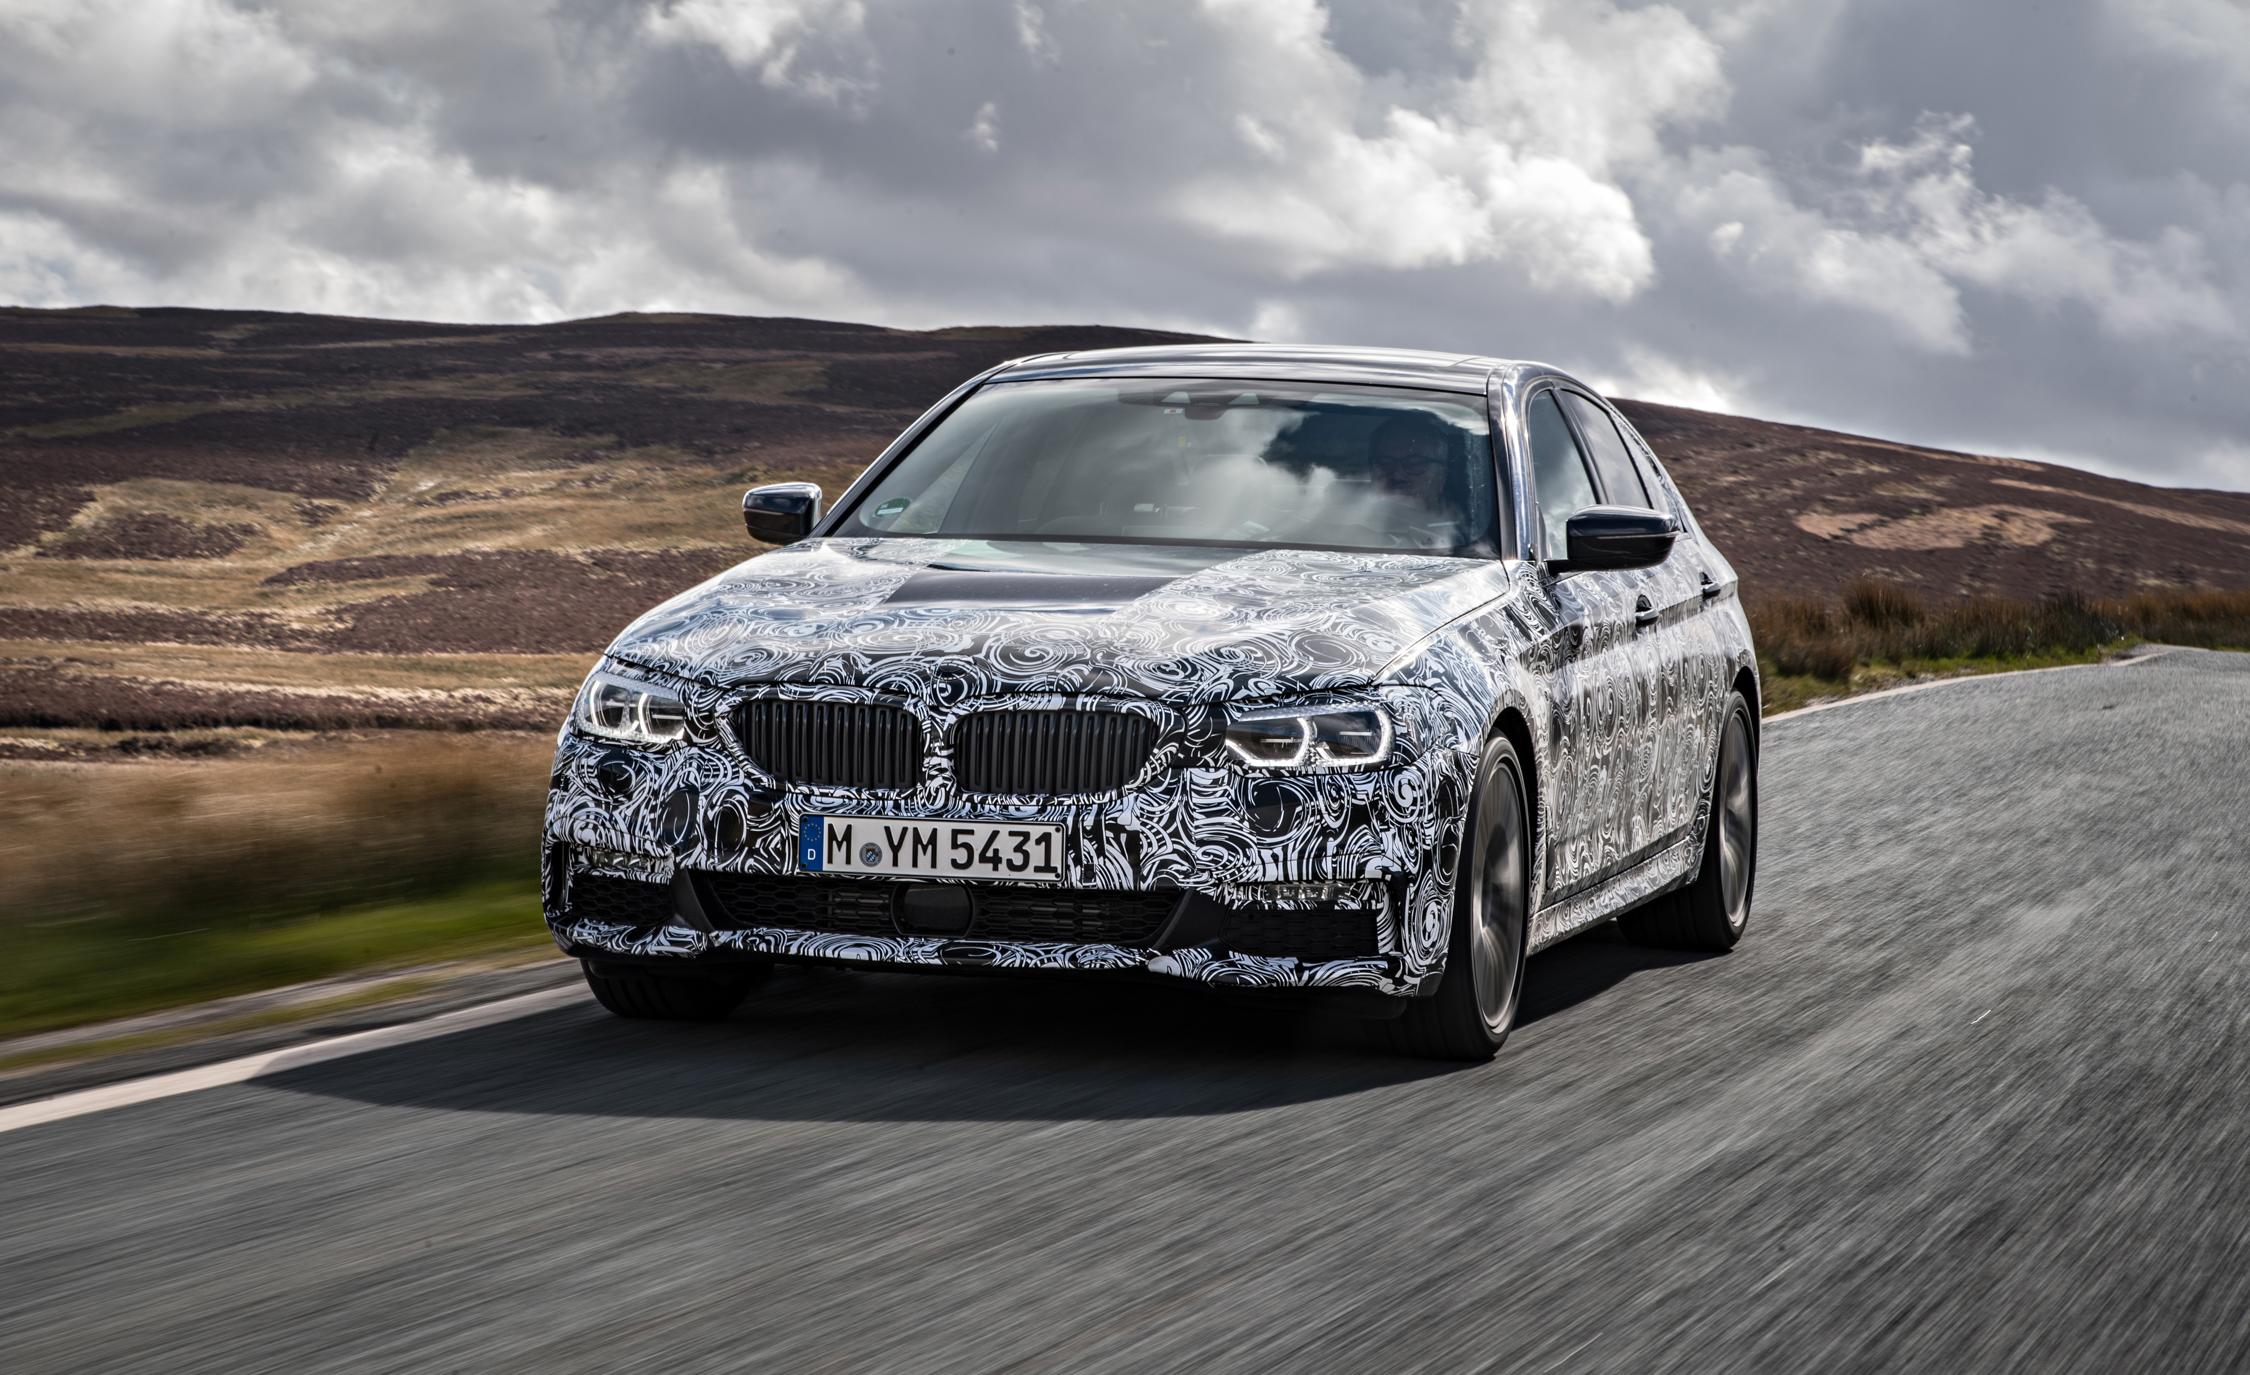 2016 - [BMW] Série 5 Berline & Touring [G30/G31] - Page 16 2018-BMW-5-series-prototype-109